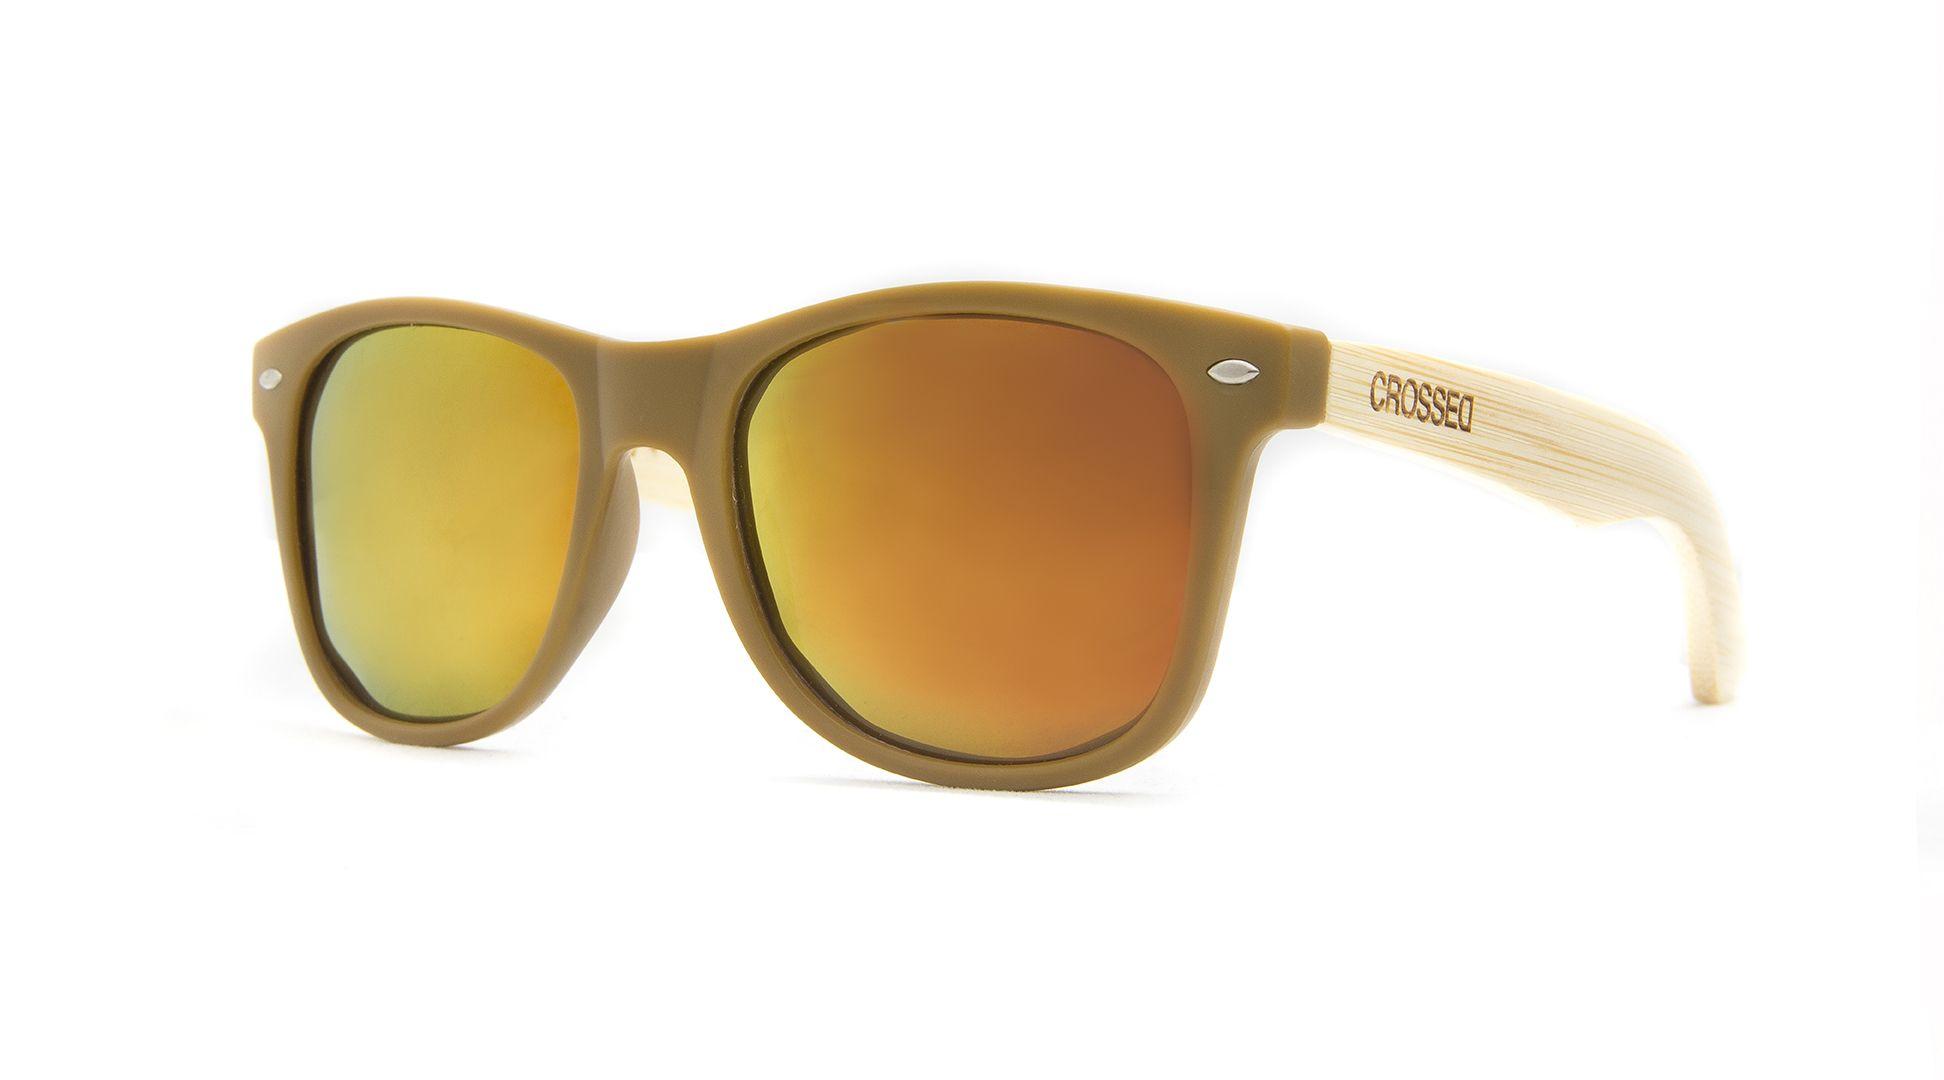 KAKI-ESPEJO NARANJA - 49,95€ - BAMBU - CROSSED Sunglasses | gafas de madera, polarizadas, moda, wood sunglasses